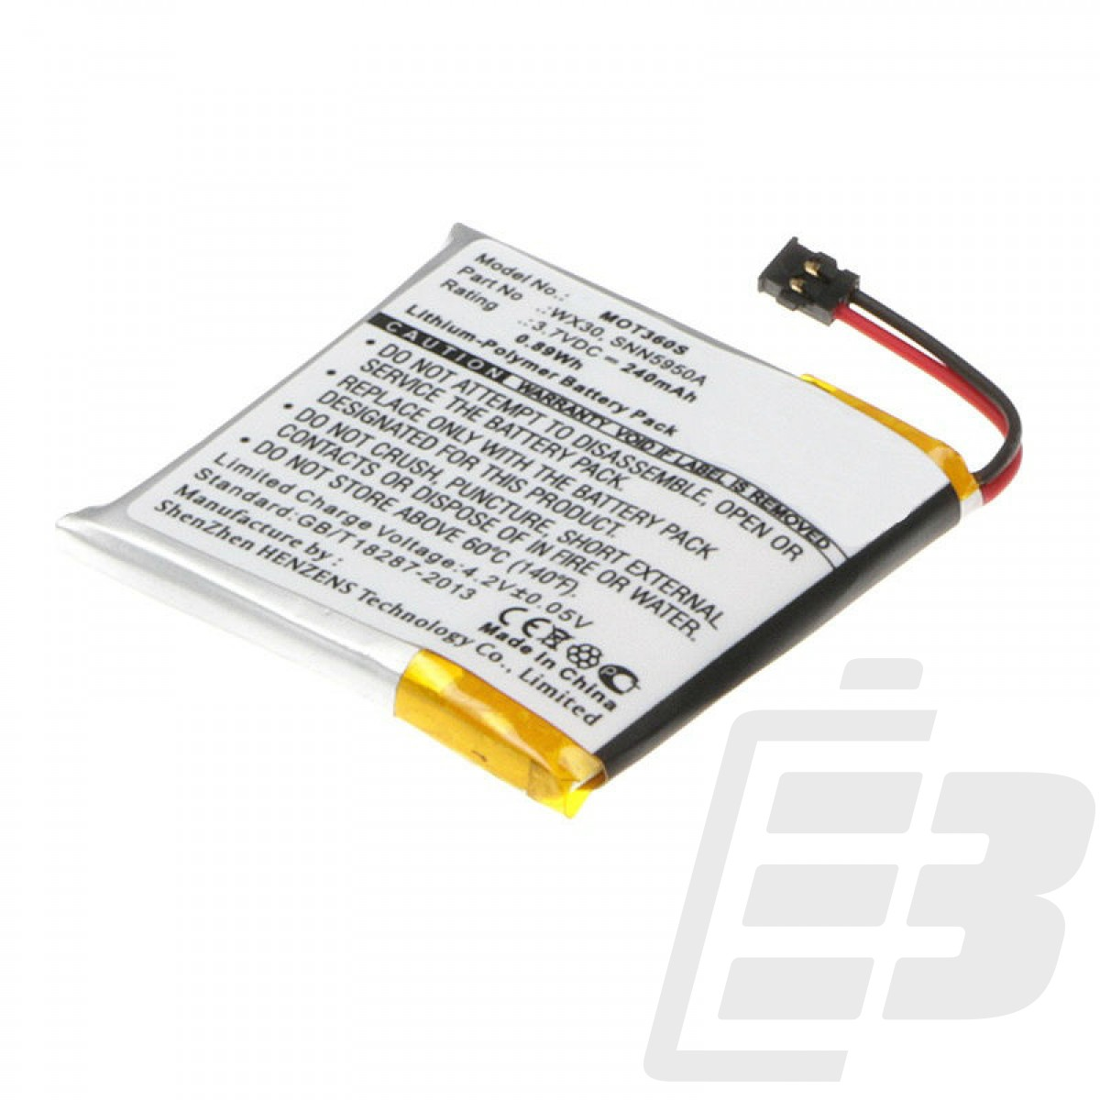 Smartwatch battery Motorola Moto 360_1